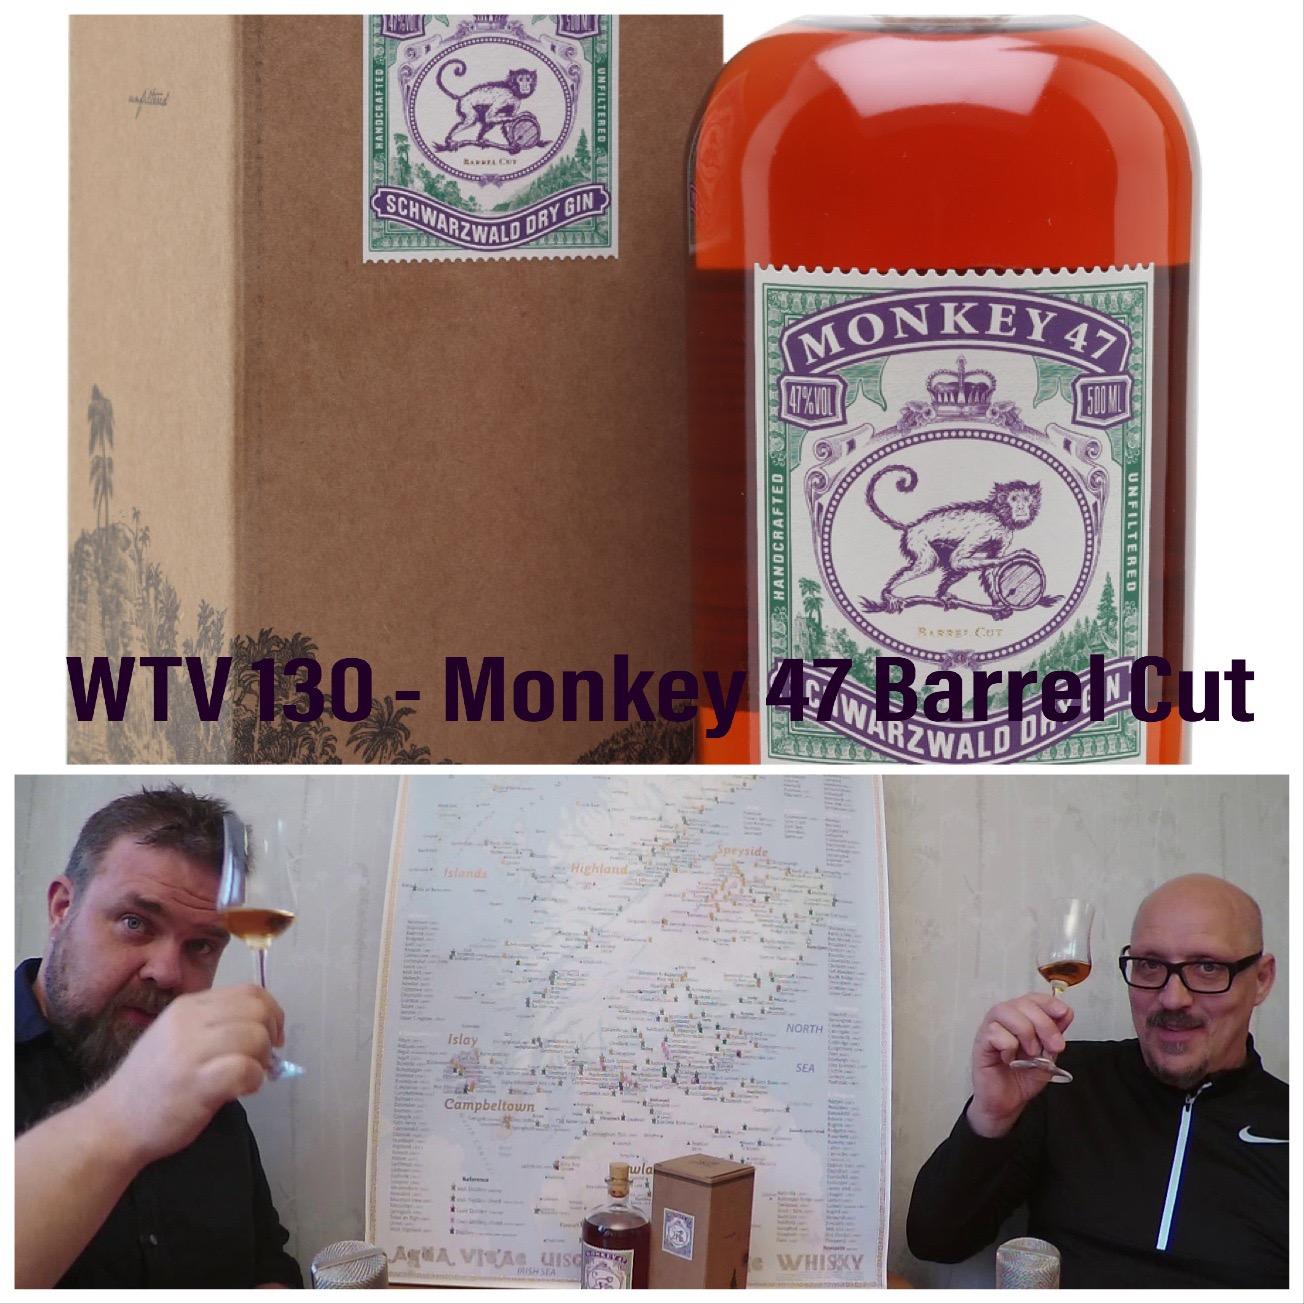 WTV 130 – Monkey 47 Barrel Cut